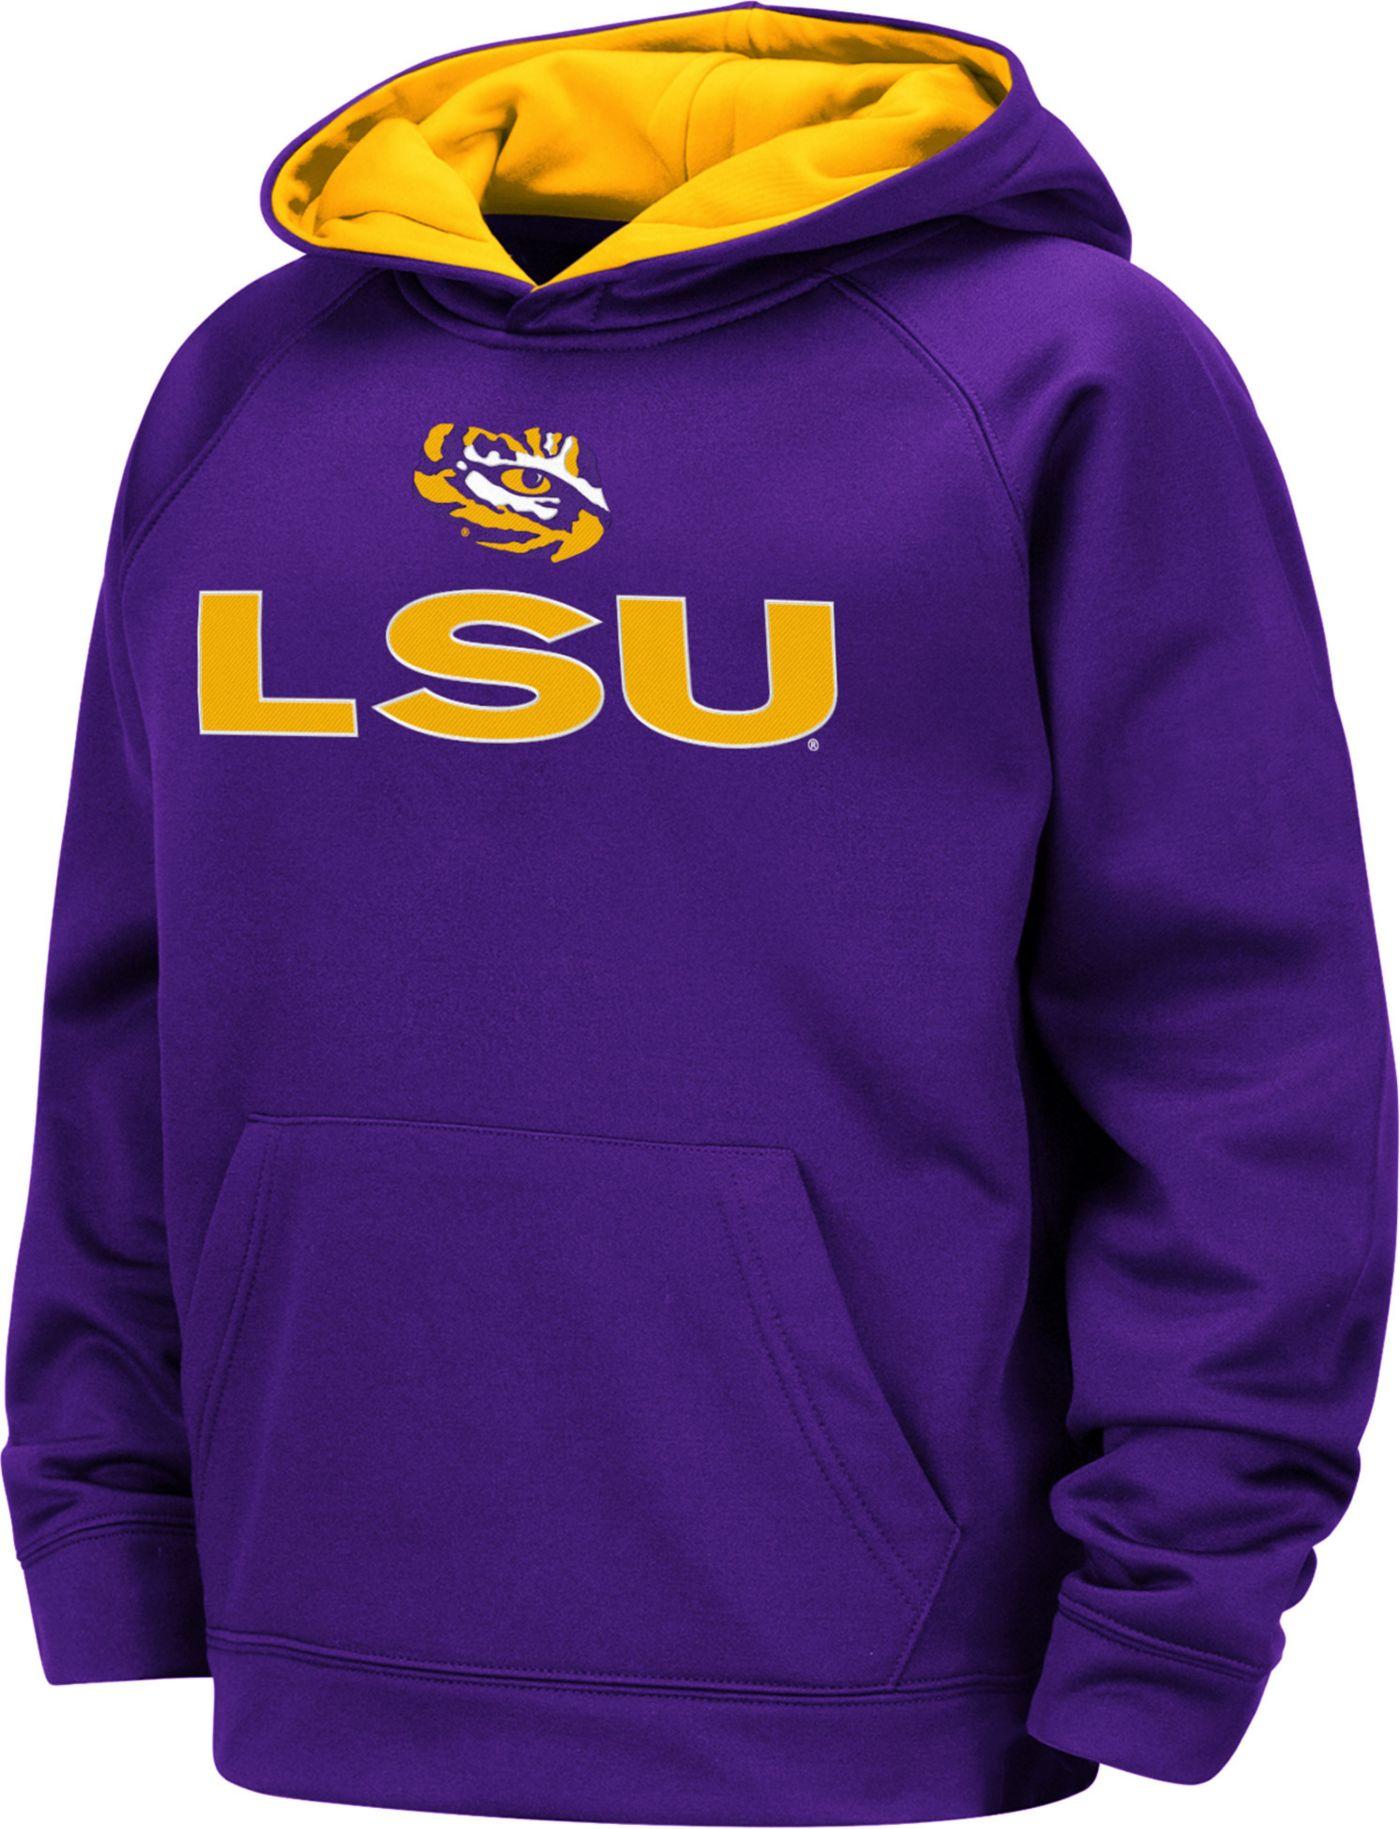 Colosseum Boys' LSU Tigers Purple Pullover Hoodie